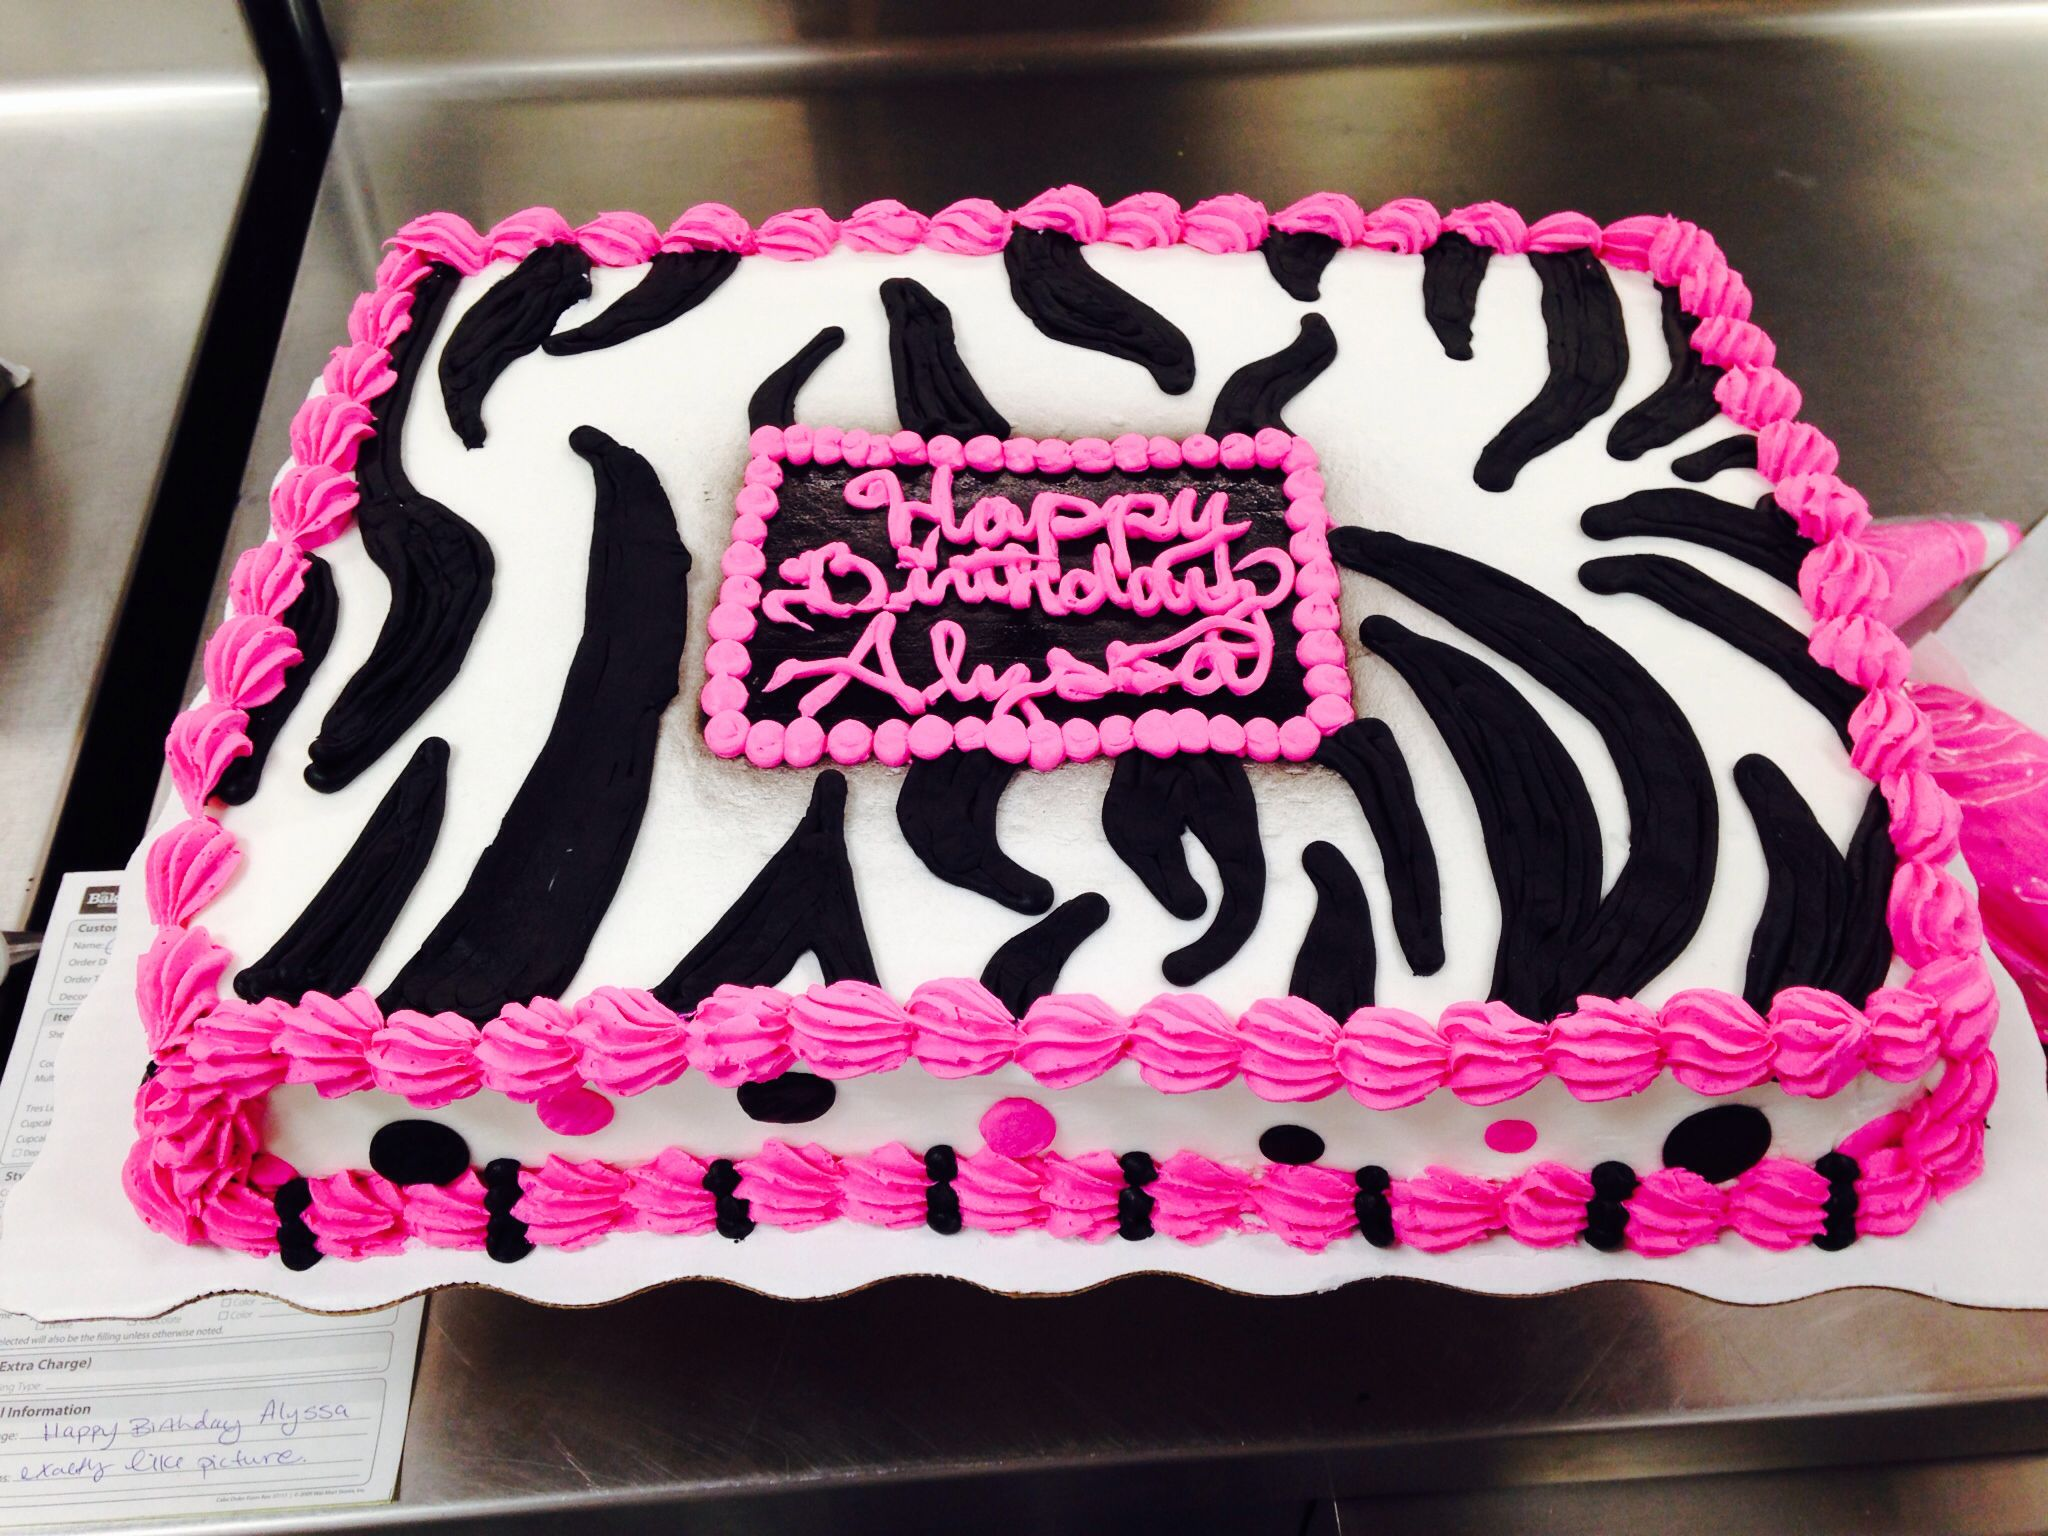 Magnificent Craftylillybargainbin Blogspot Com Zebra Birthday Cakes At Birthday Cards Printable Riciscafe Filternl